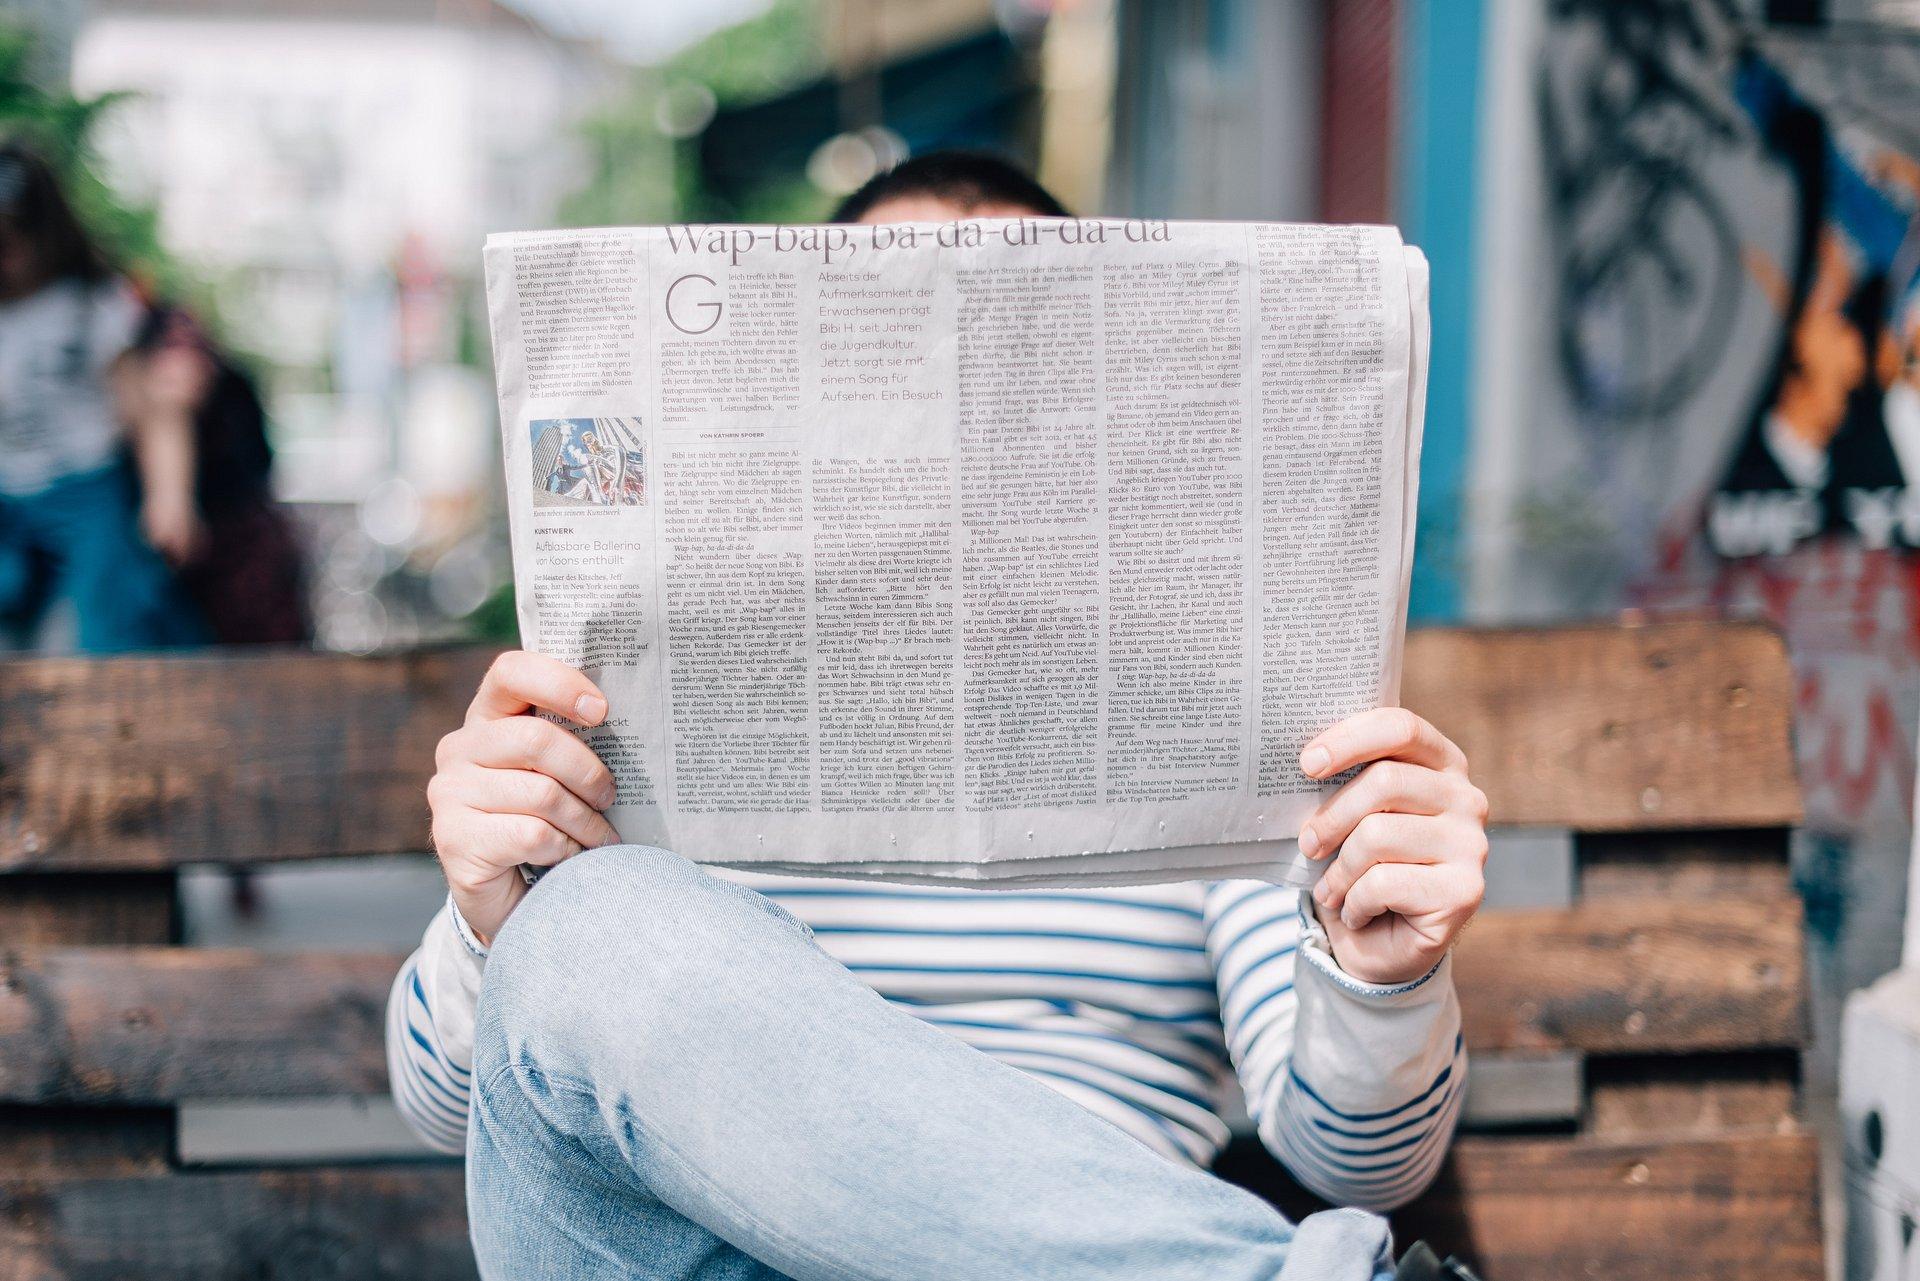 Bez gazetki ani rusz